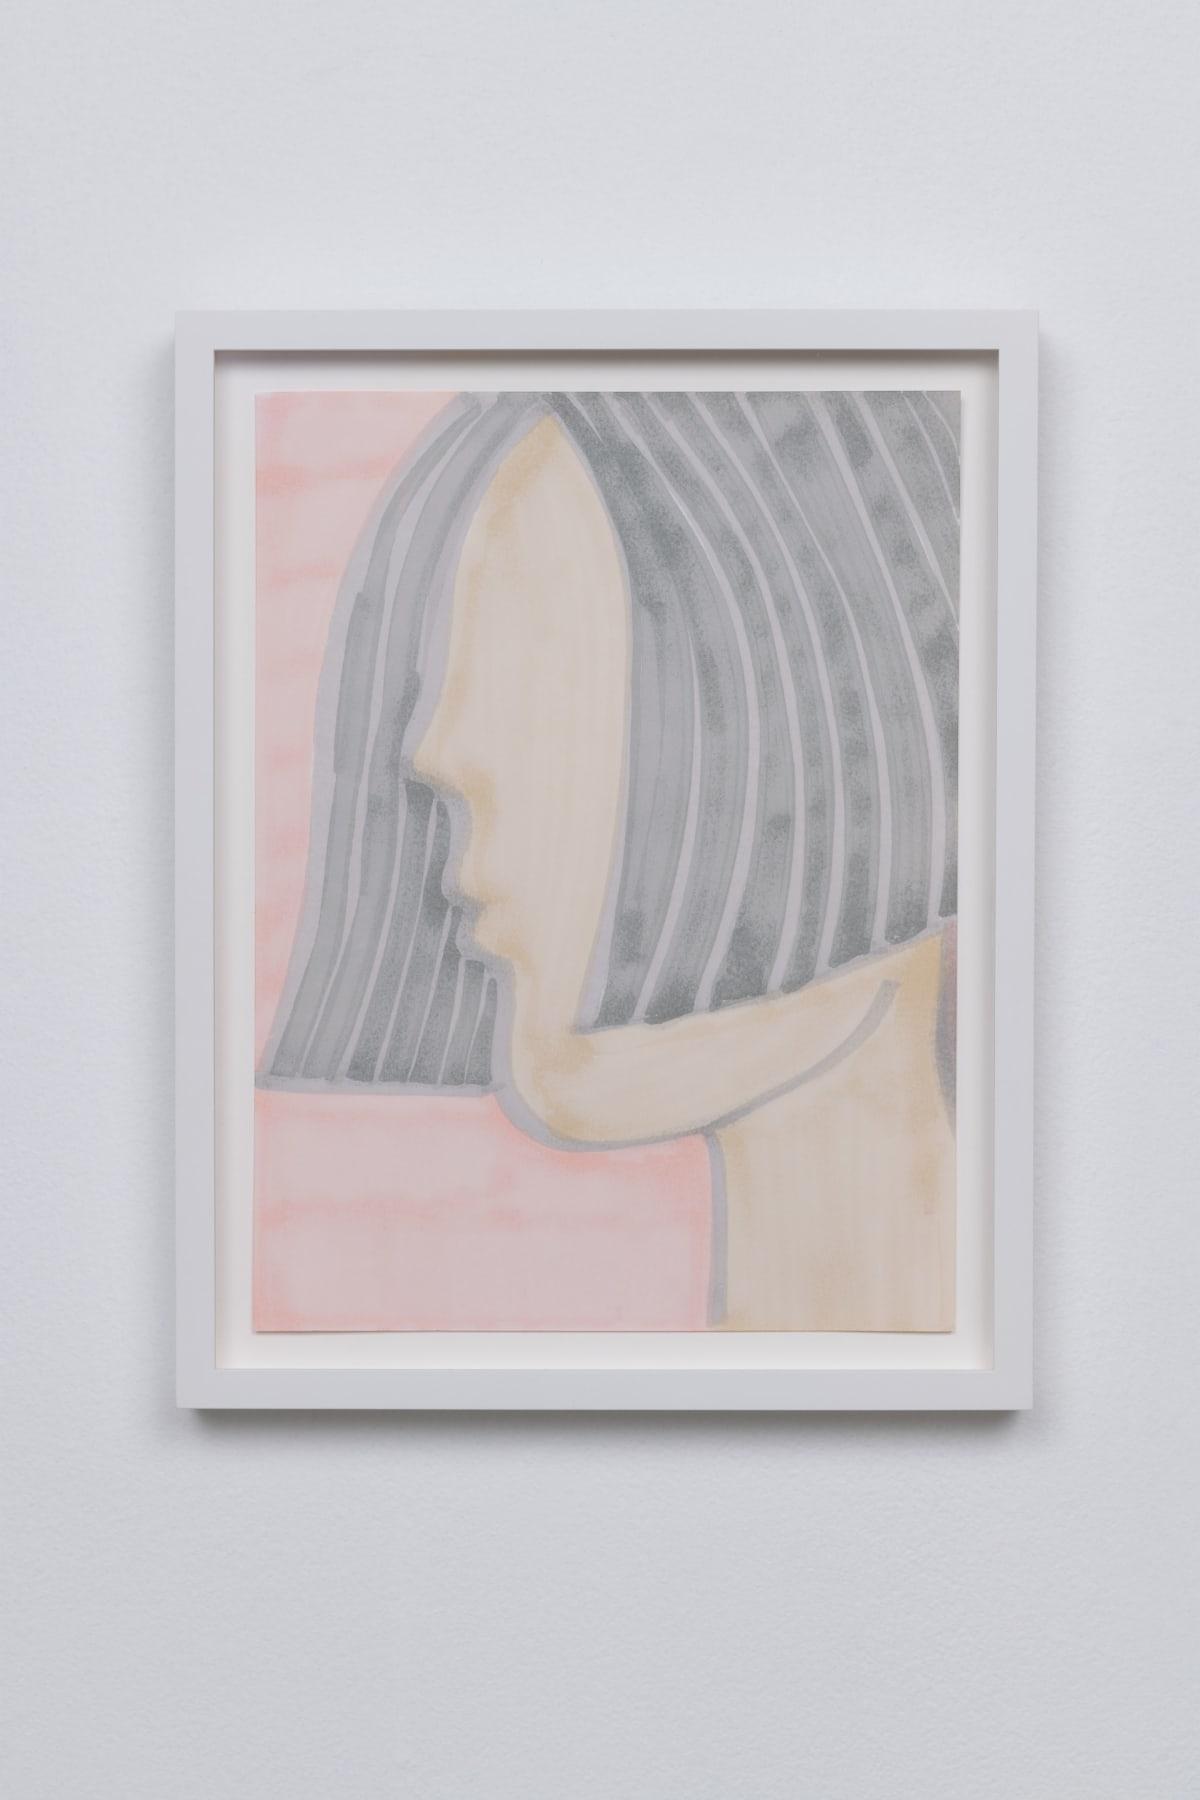 Annesta Le Body I, 2019 Marker on paper 12 x 9 in 30.5 x 22.9 cm